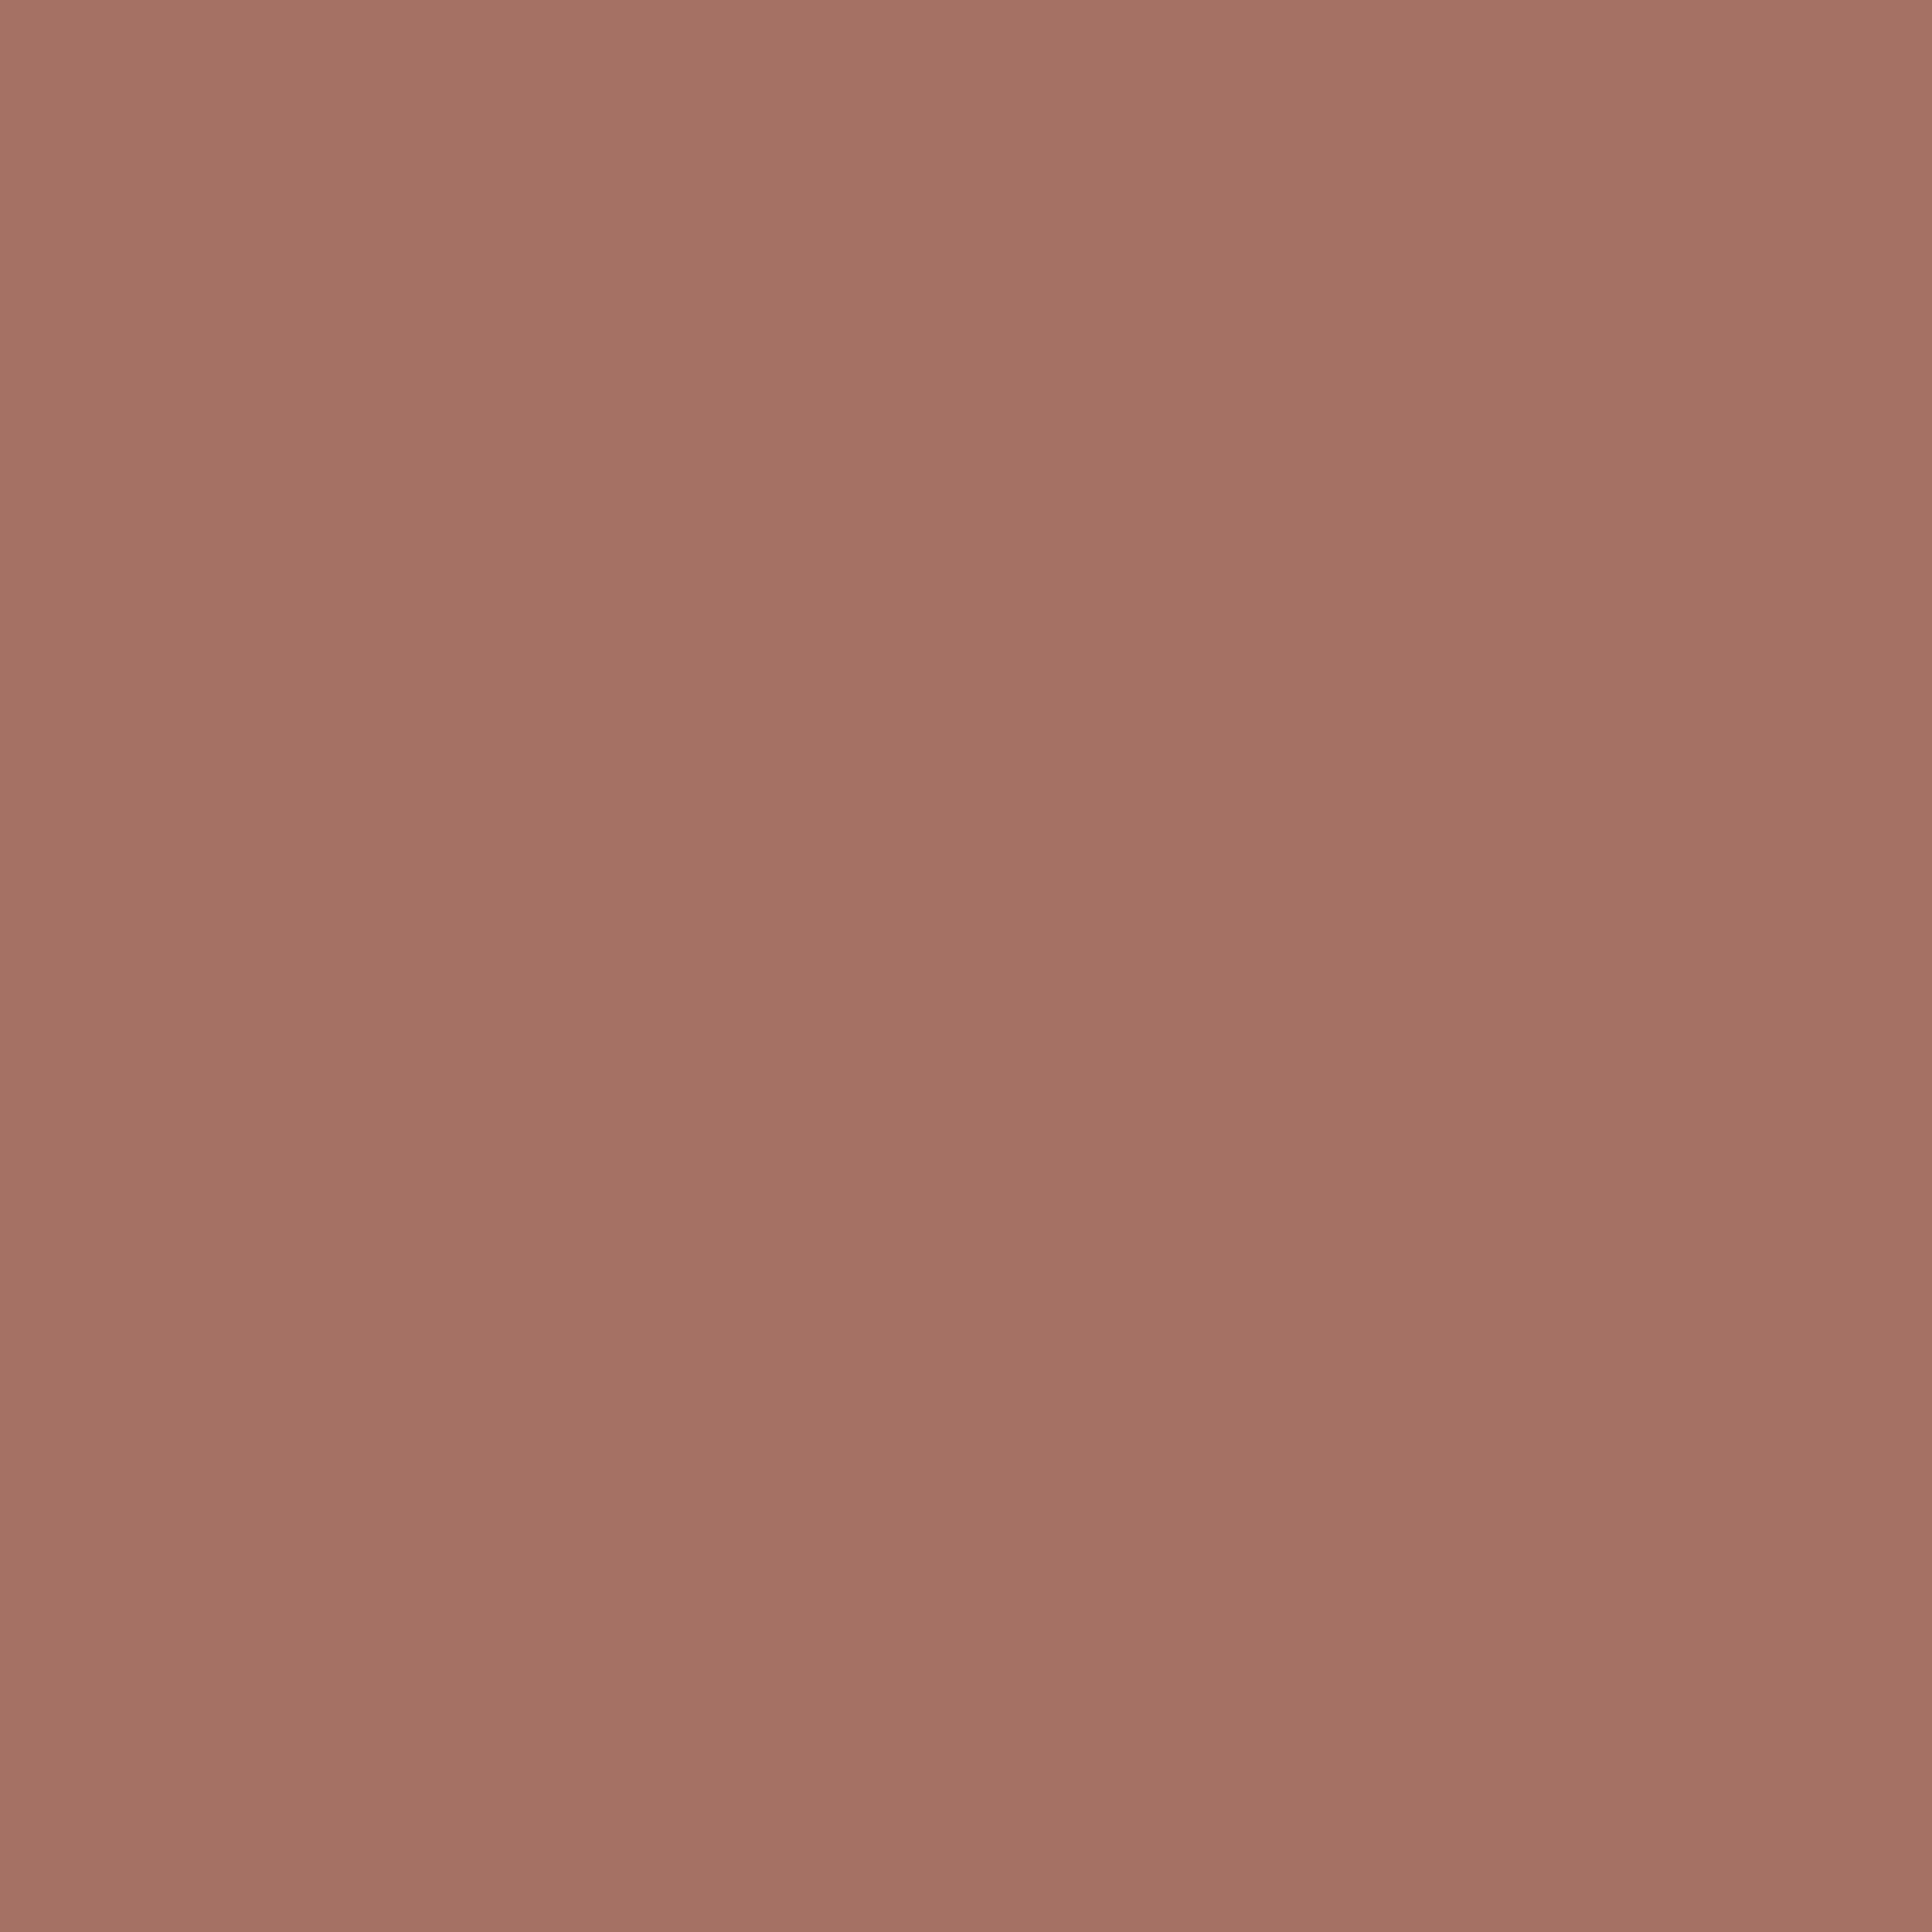 2048x2048 Blast-off Bronze Solid Color Background